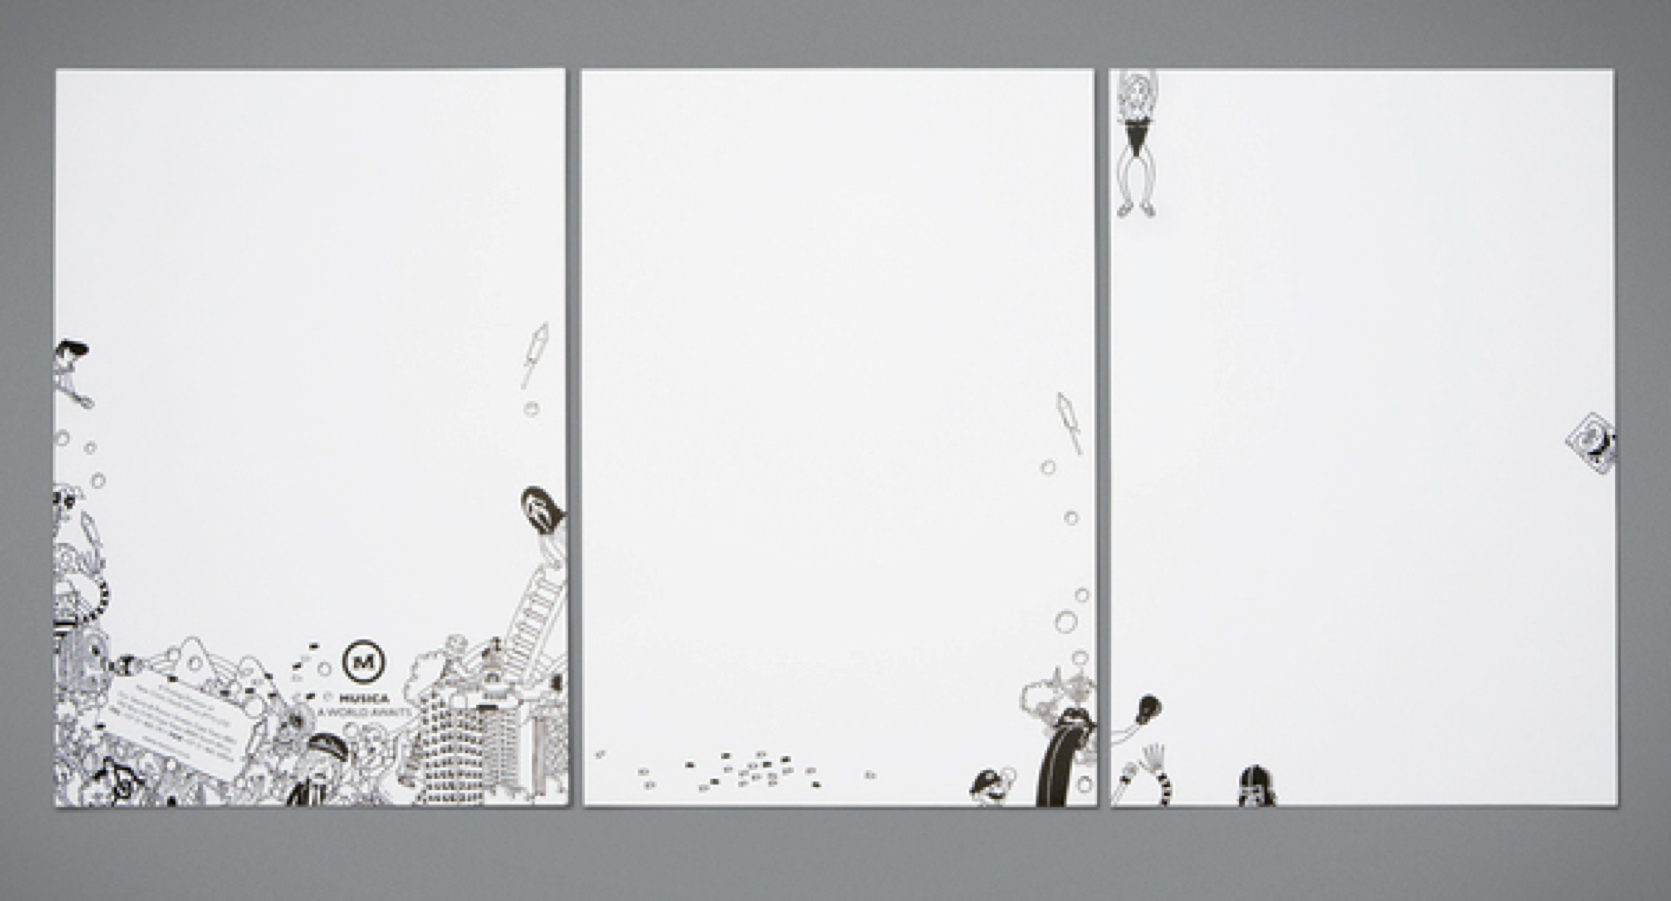 9 Amazing Business/ Company Letterhead Designs